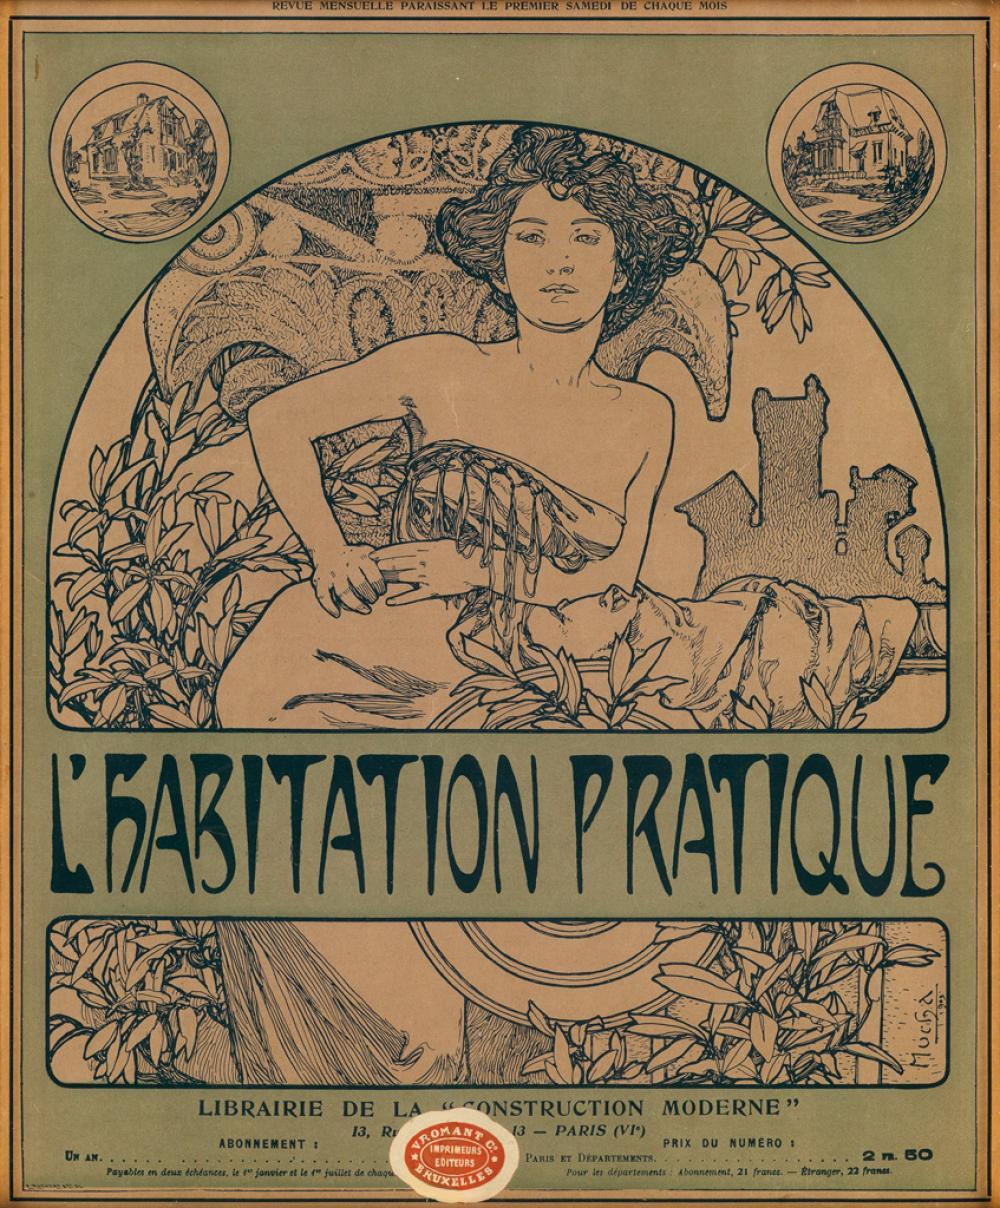 ALPHONSE MUCHA (1860-1939). L''HABITATION PRATIQUE. Magazine cover. Circa 1905. 15x12 inches, 38x31 cm. L. Ruckert et Cie, [Paris.]